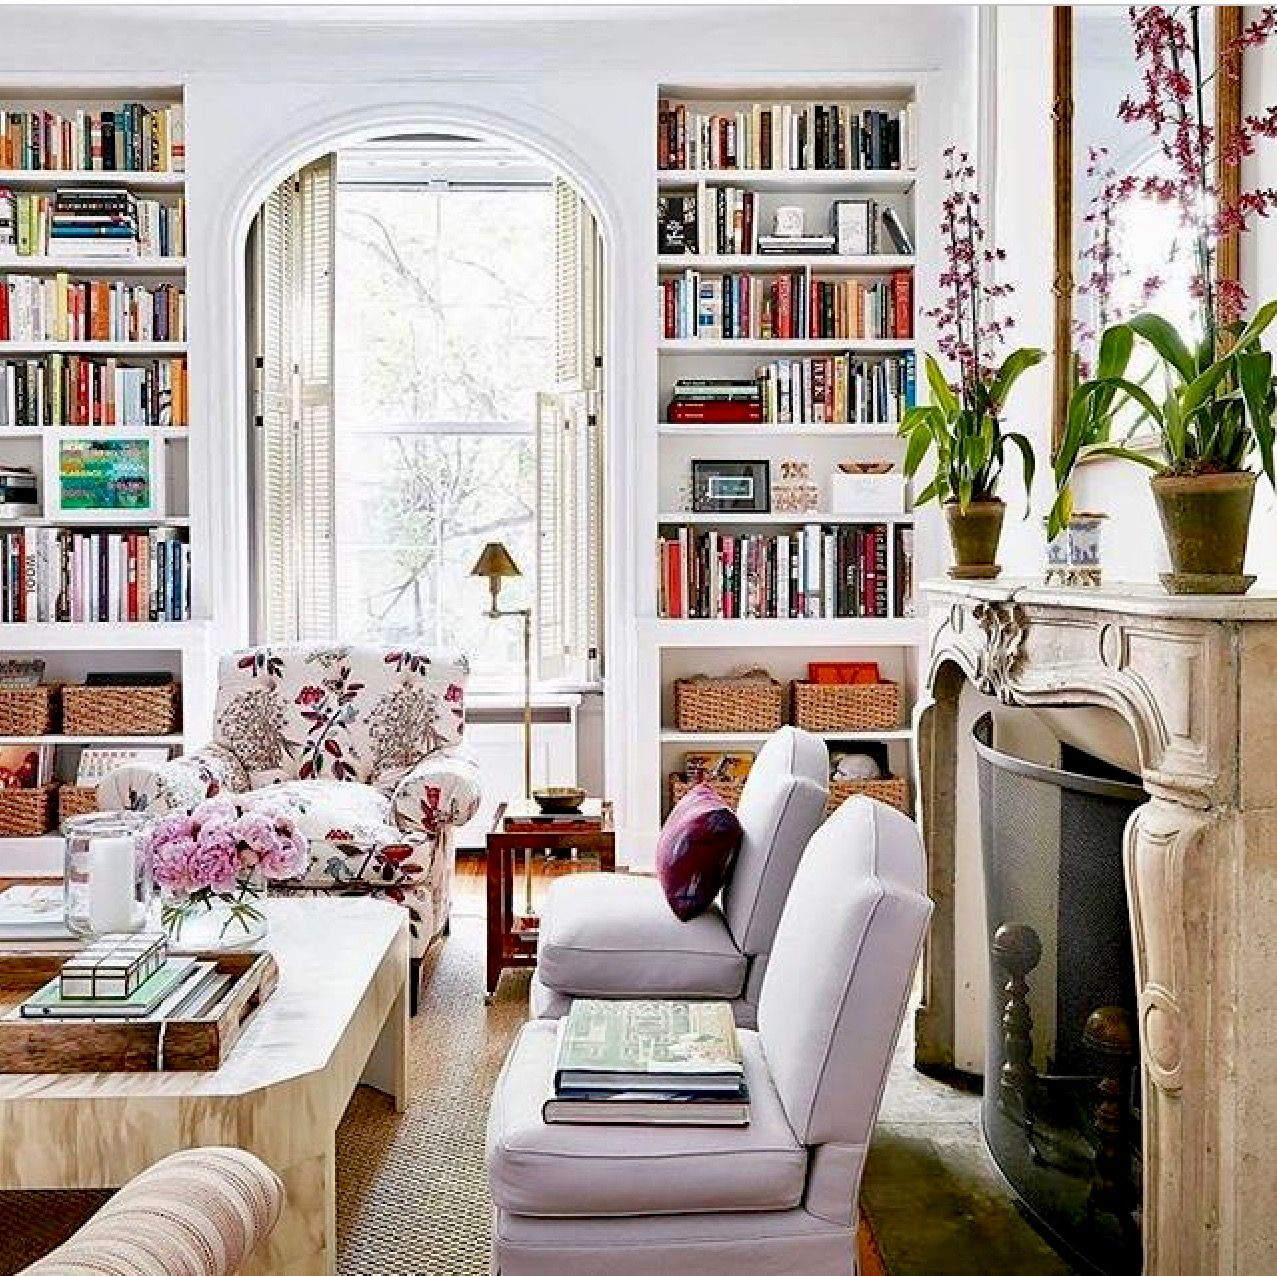 51 Modern Living Room Design From Talented Architects: Image Via @atelier_vignette On Instagram